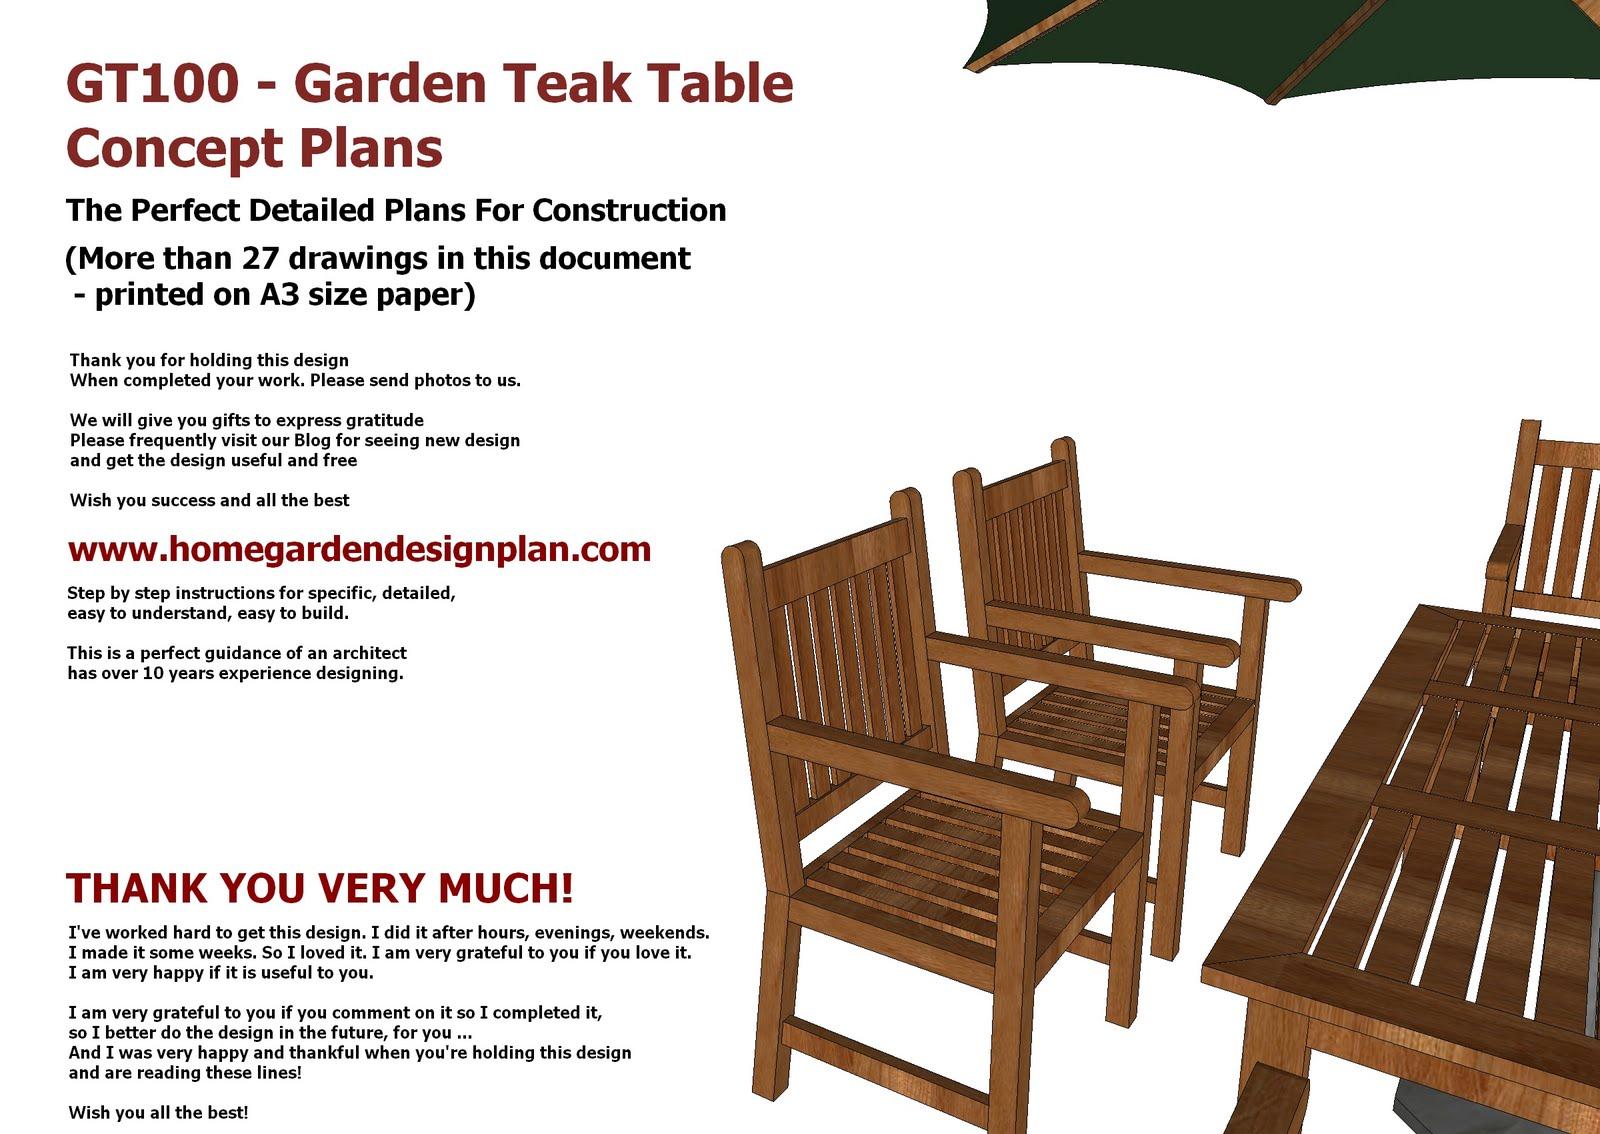 gt100 garden teak tables woodworking plans outdoor furniture plans the